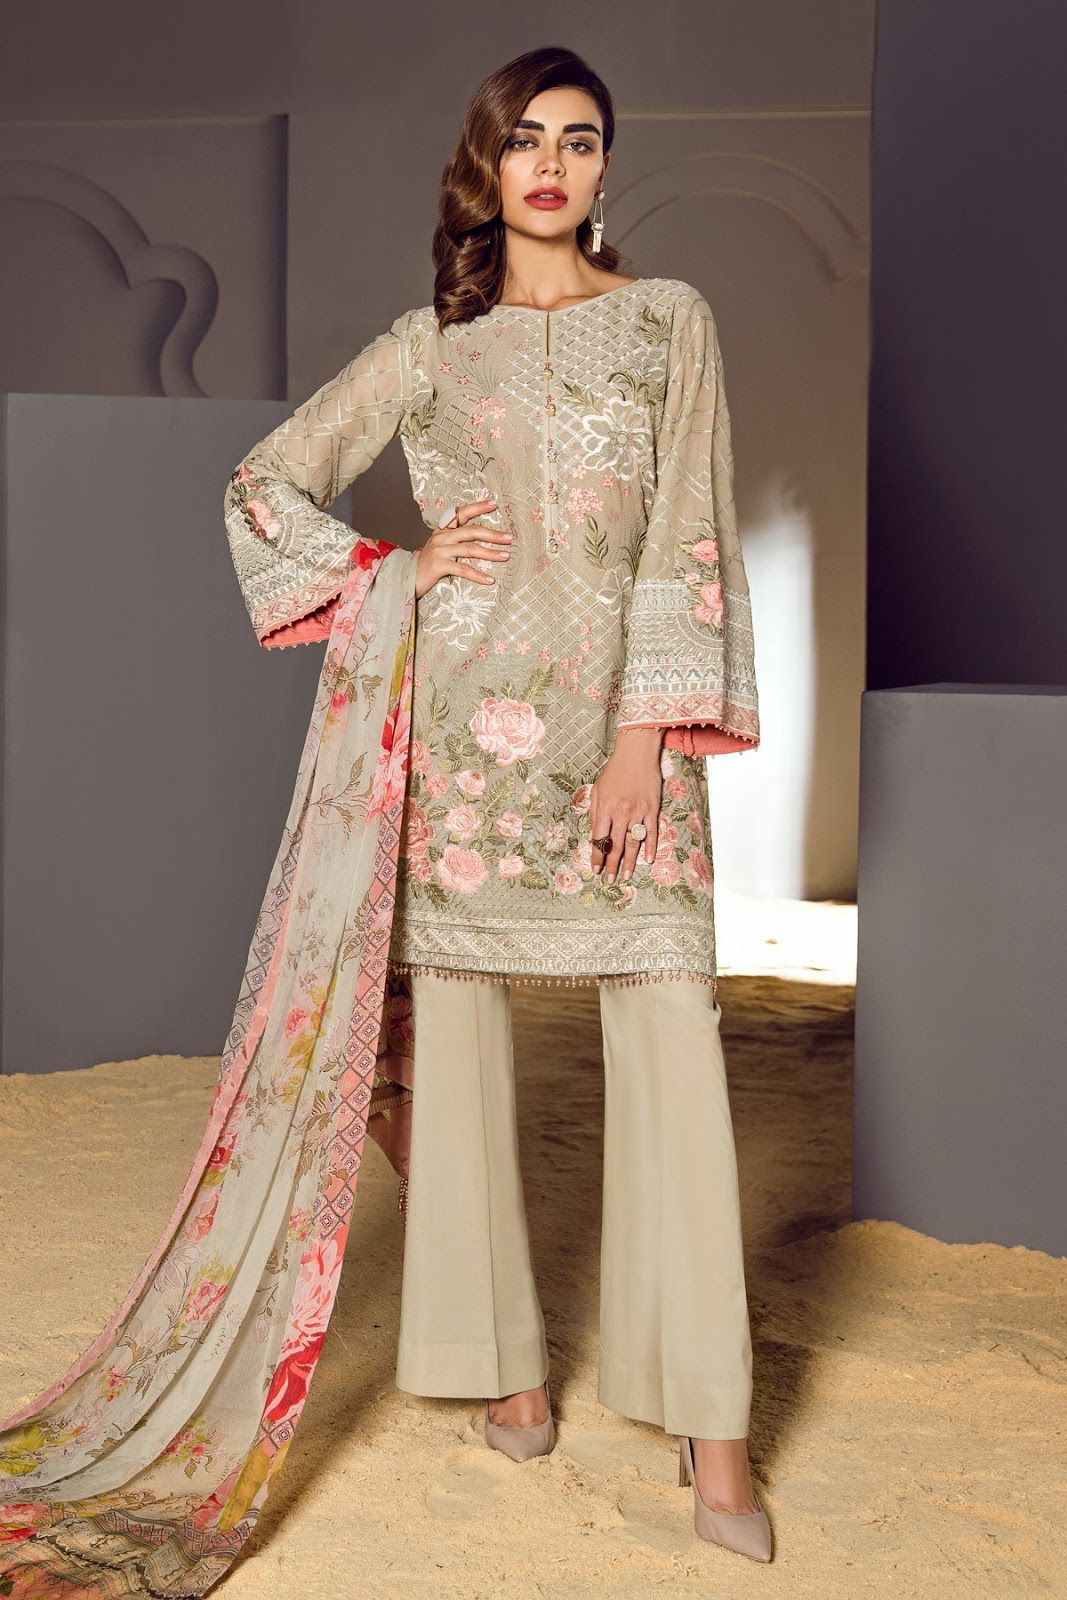 Pakistan Baroque Collection 2018 Unstitched Embroidery latest Shalwar Kamez Suit